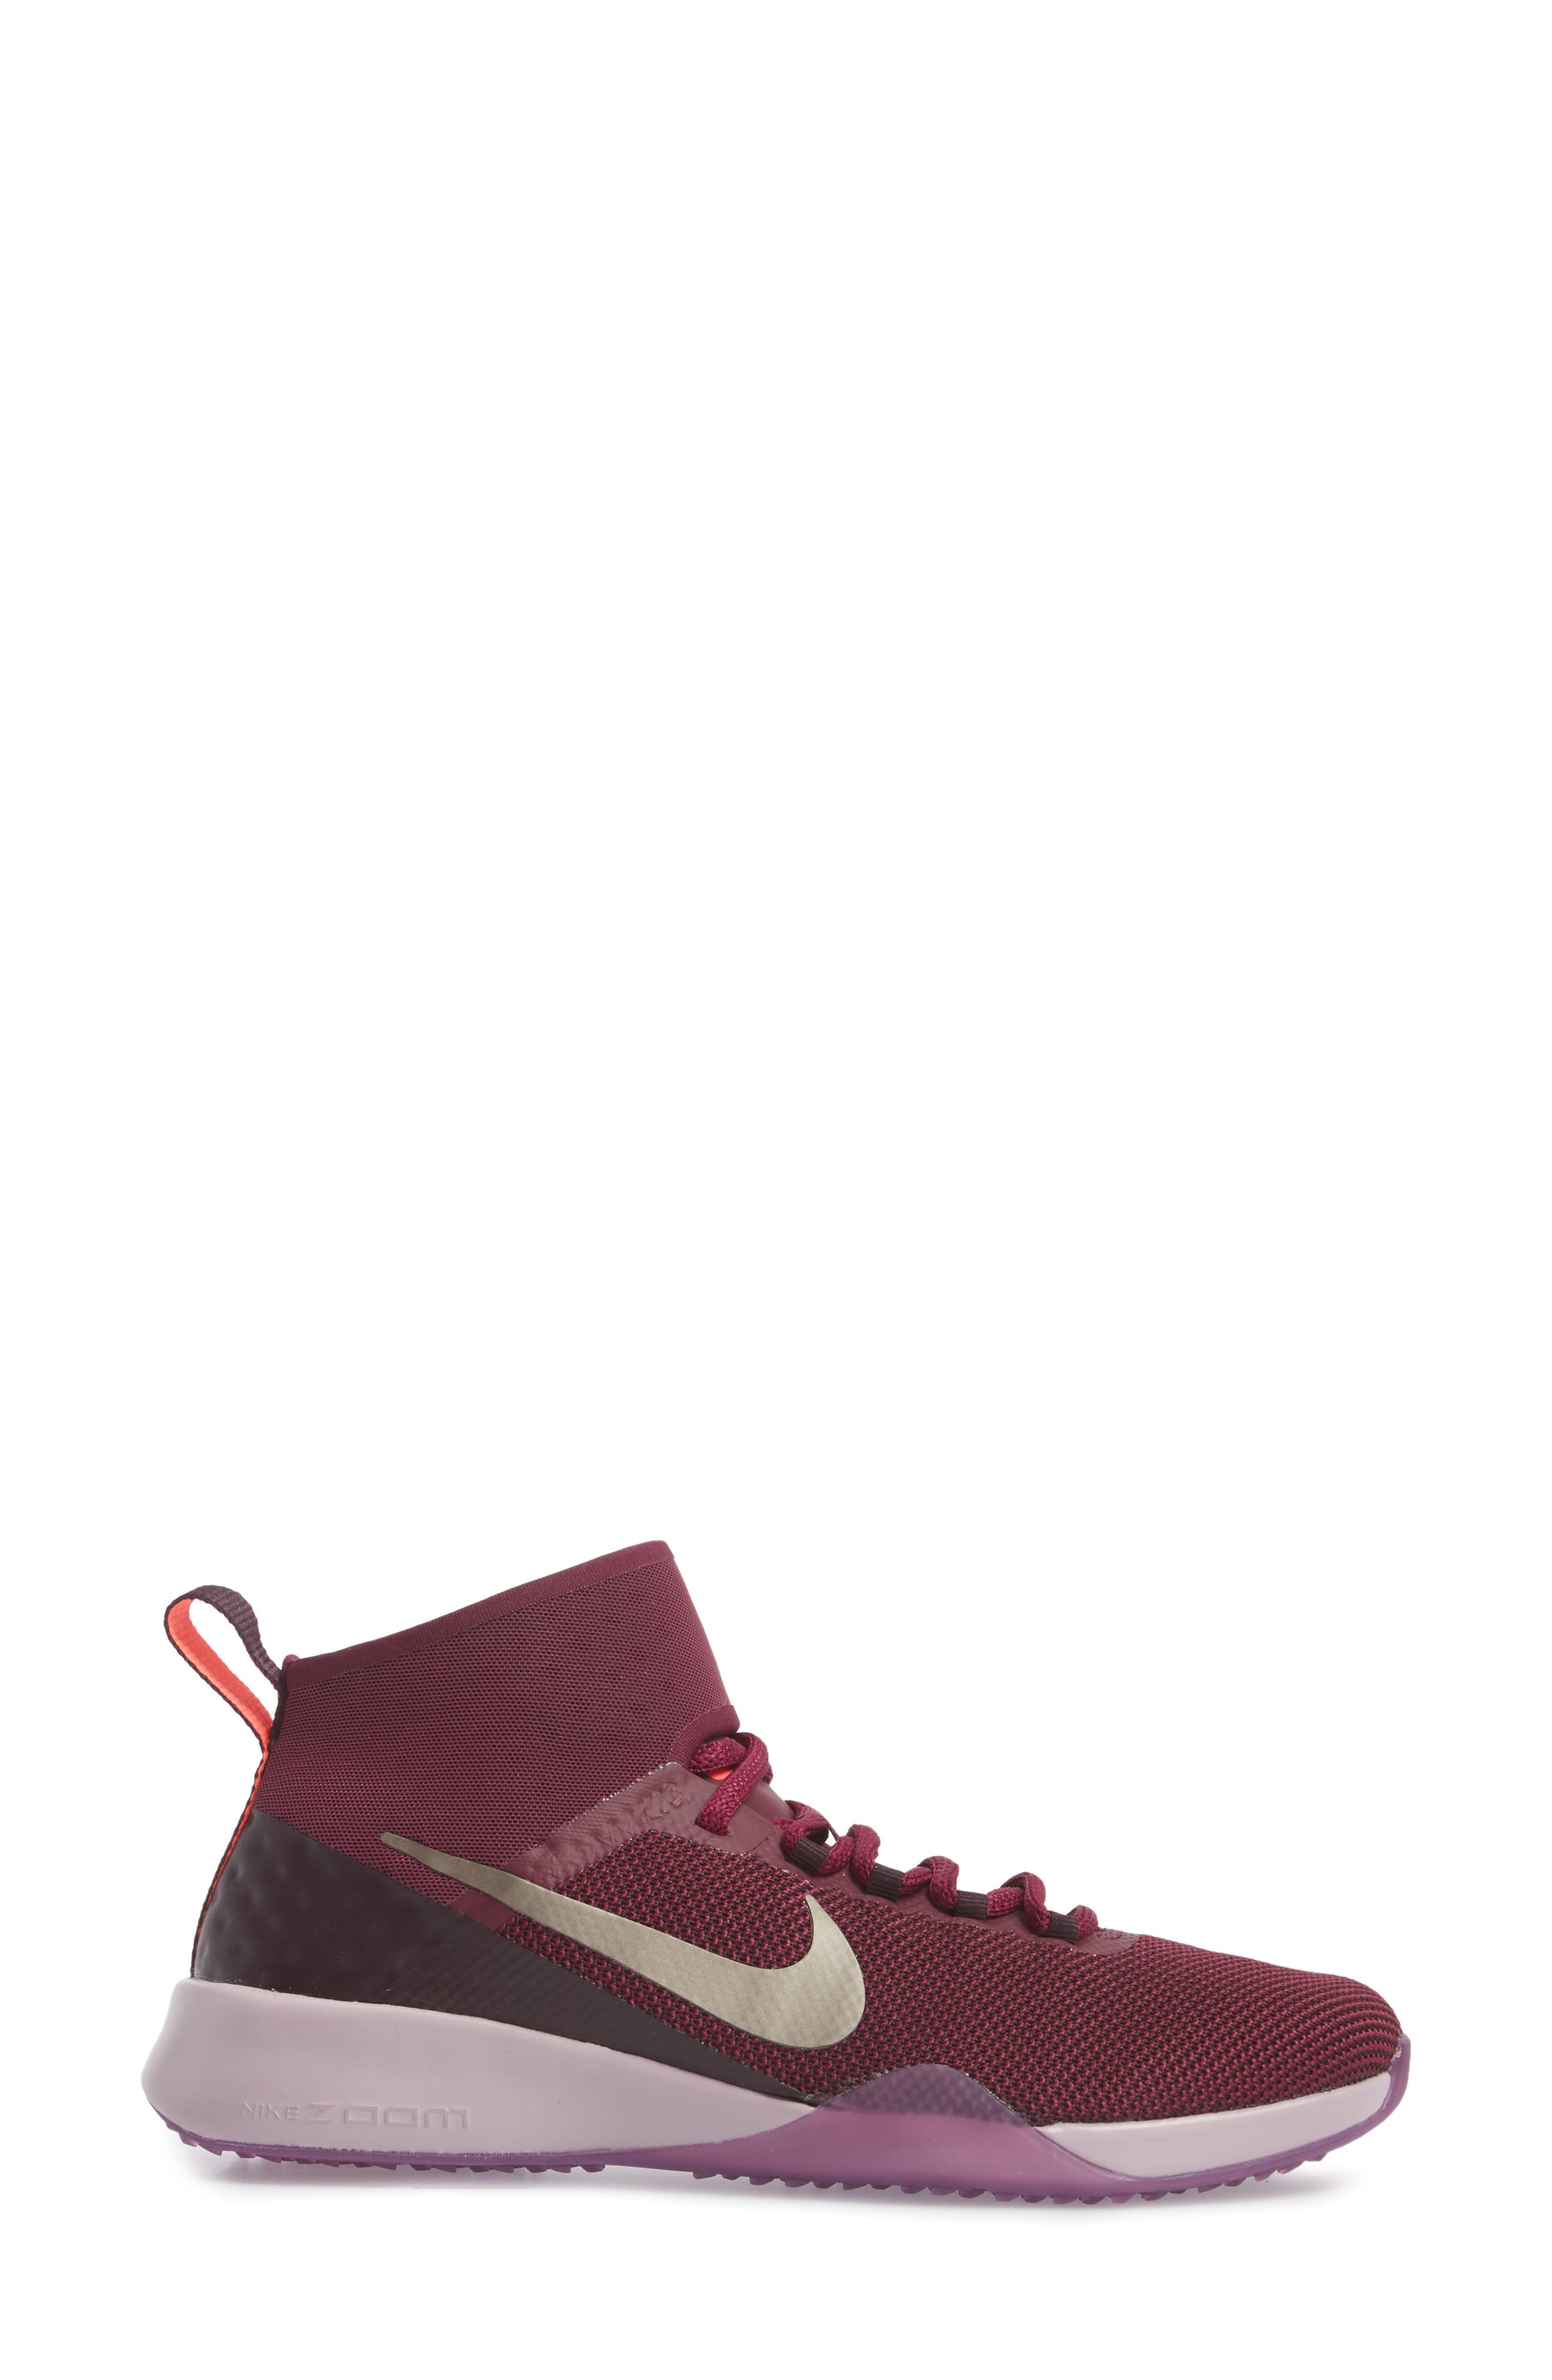 Air Zoom Strong 2 Gem Training Shoe,                             Alternate thumbnail 3, color,                             Bordeaux/ Metallic Pewter